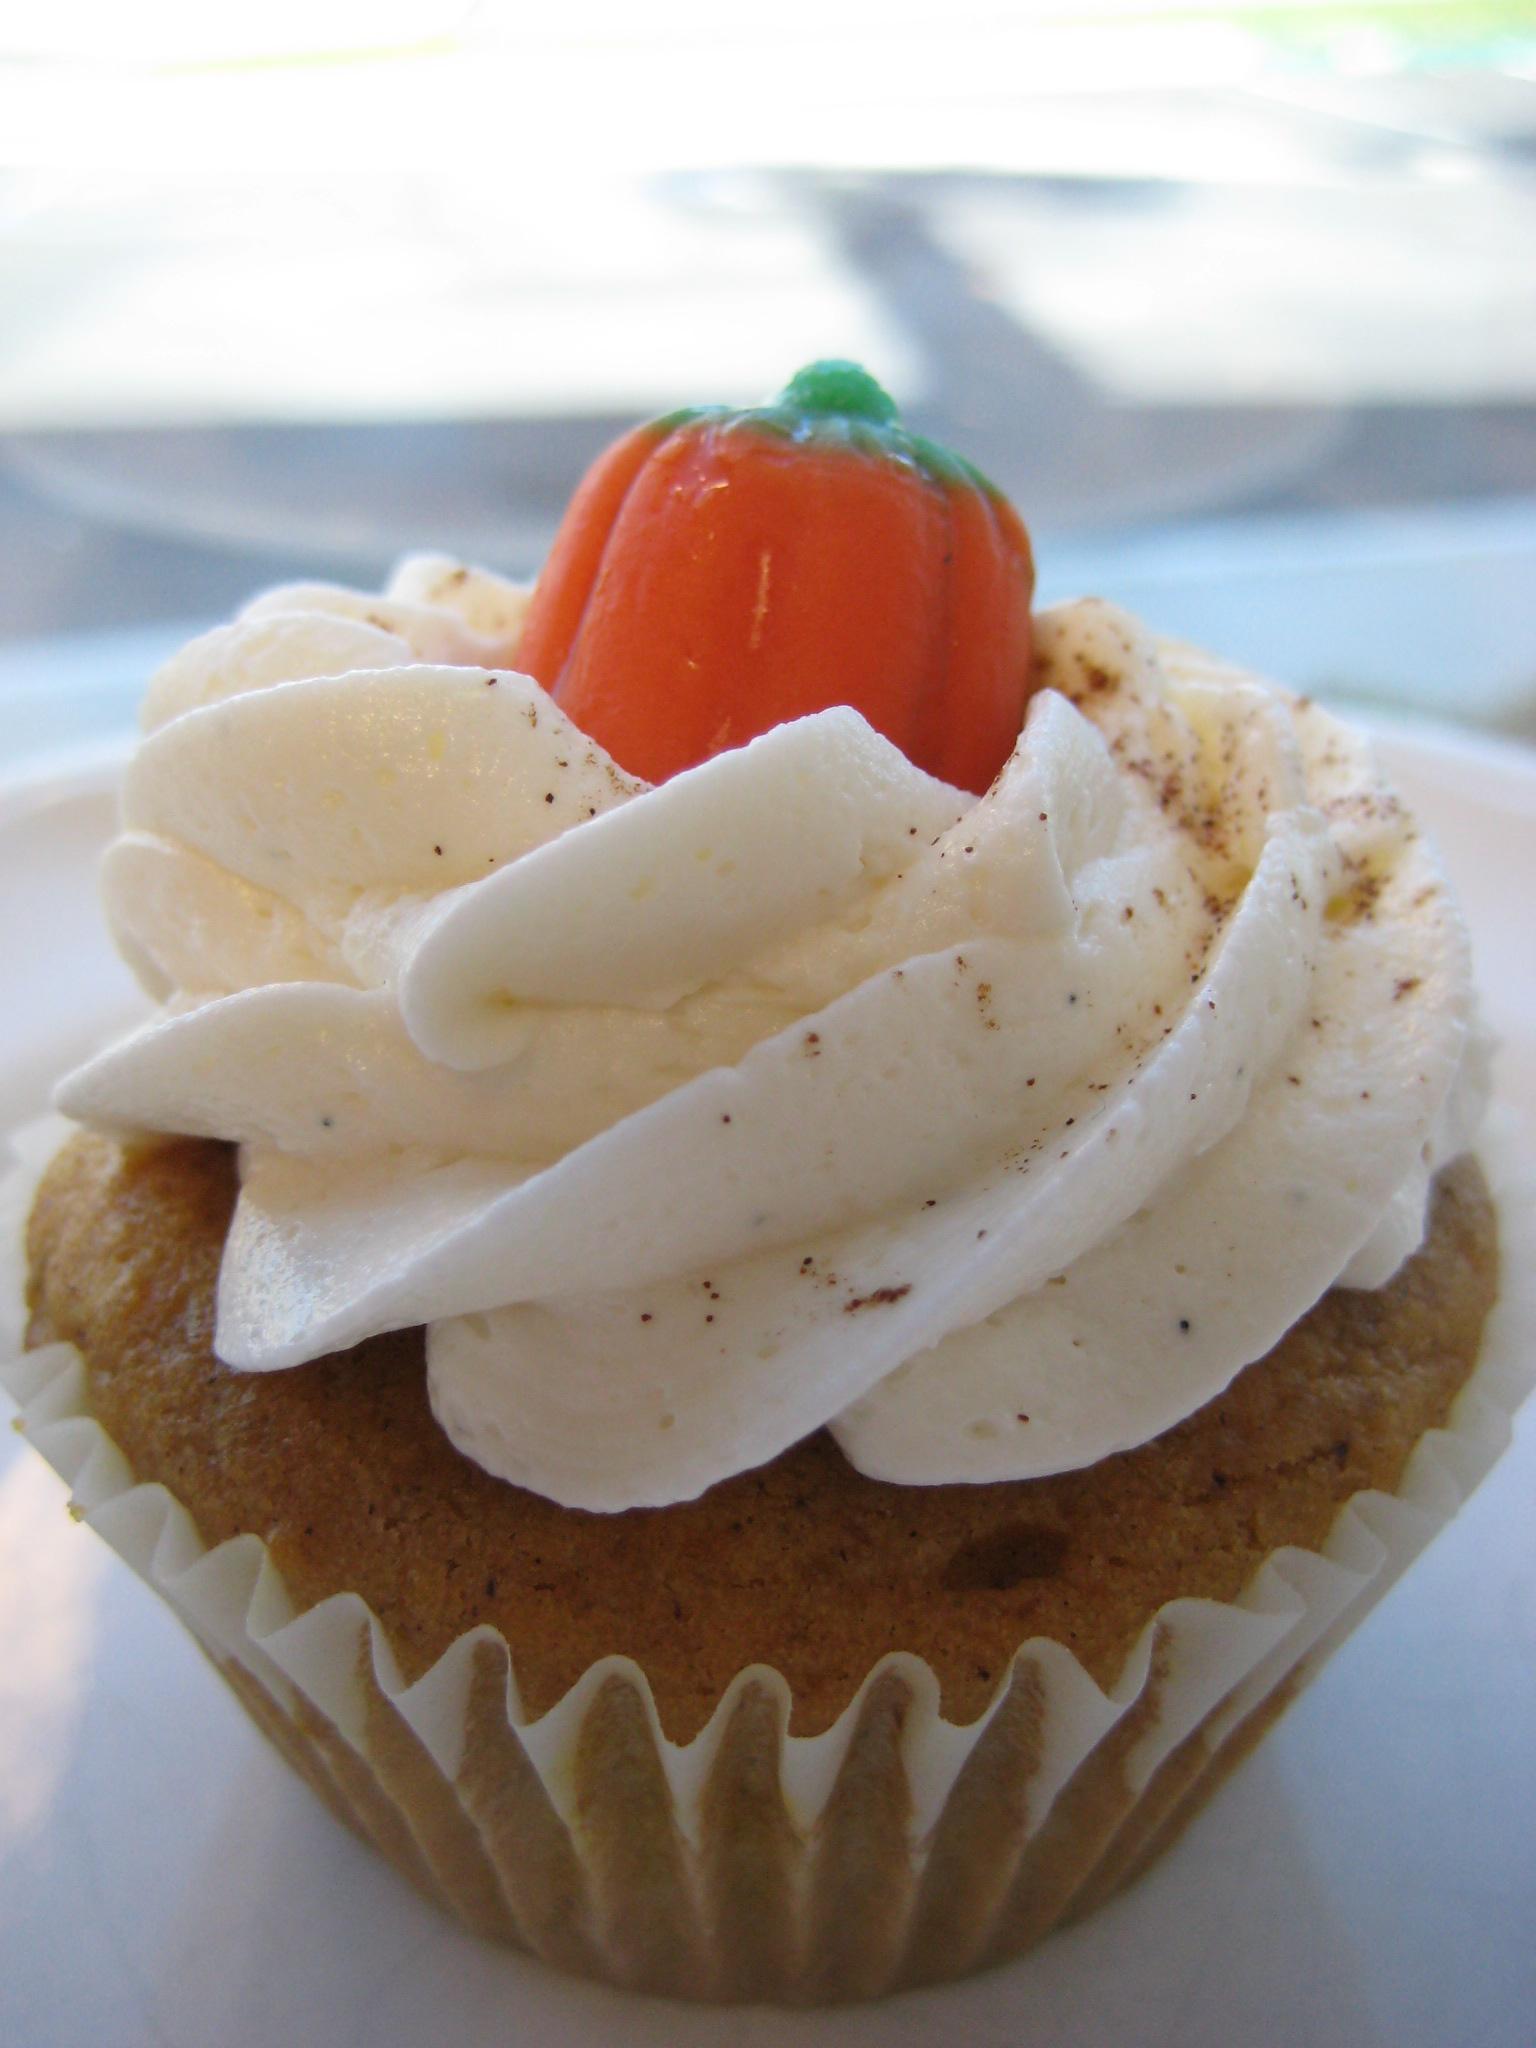 Pumpkin Cupcakes With Cake Mix  Ingredients